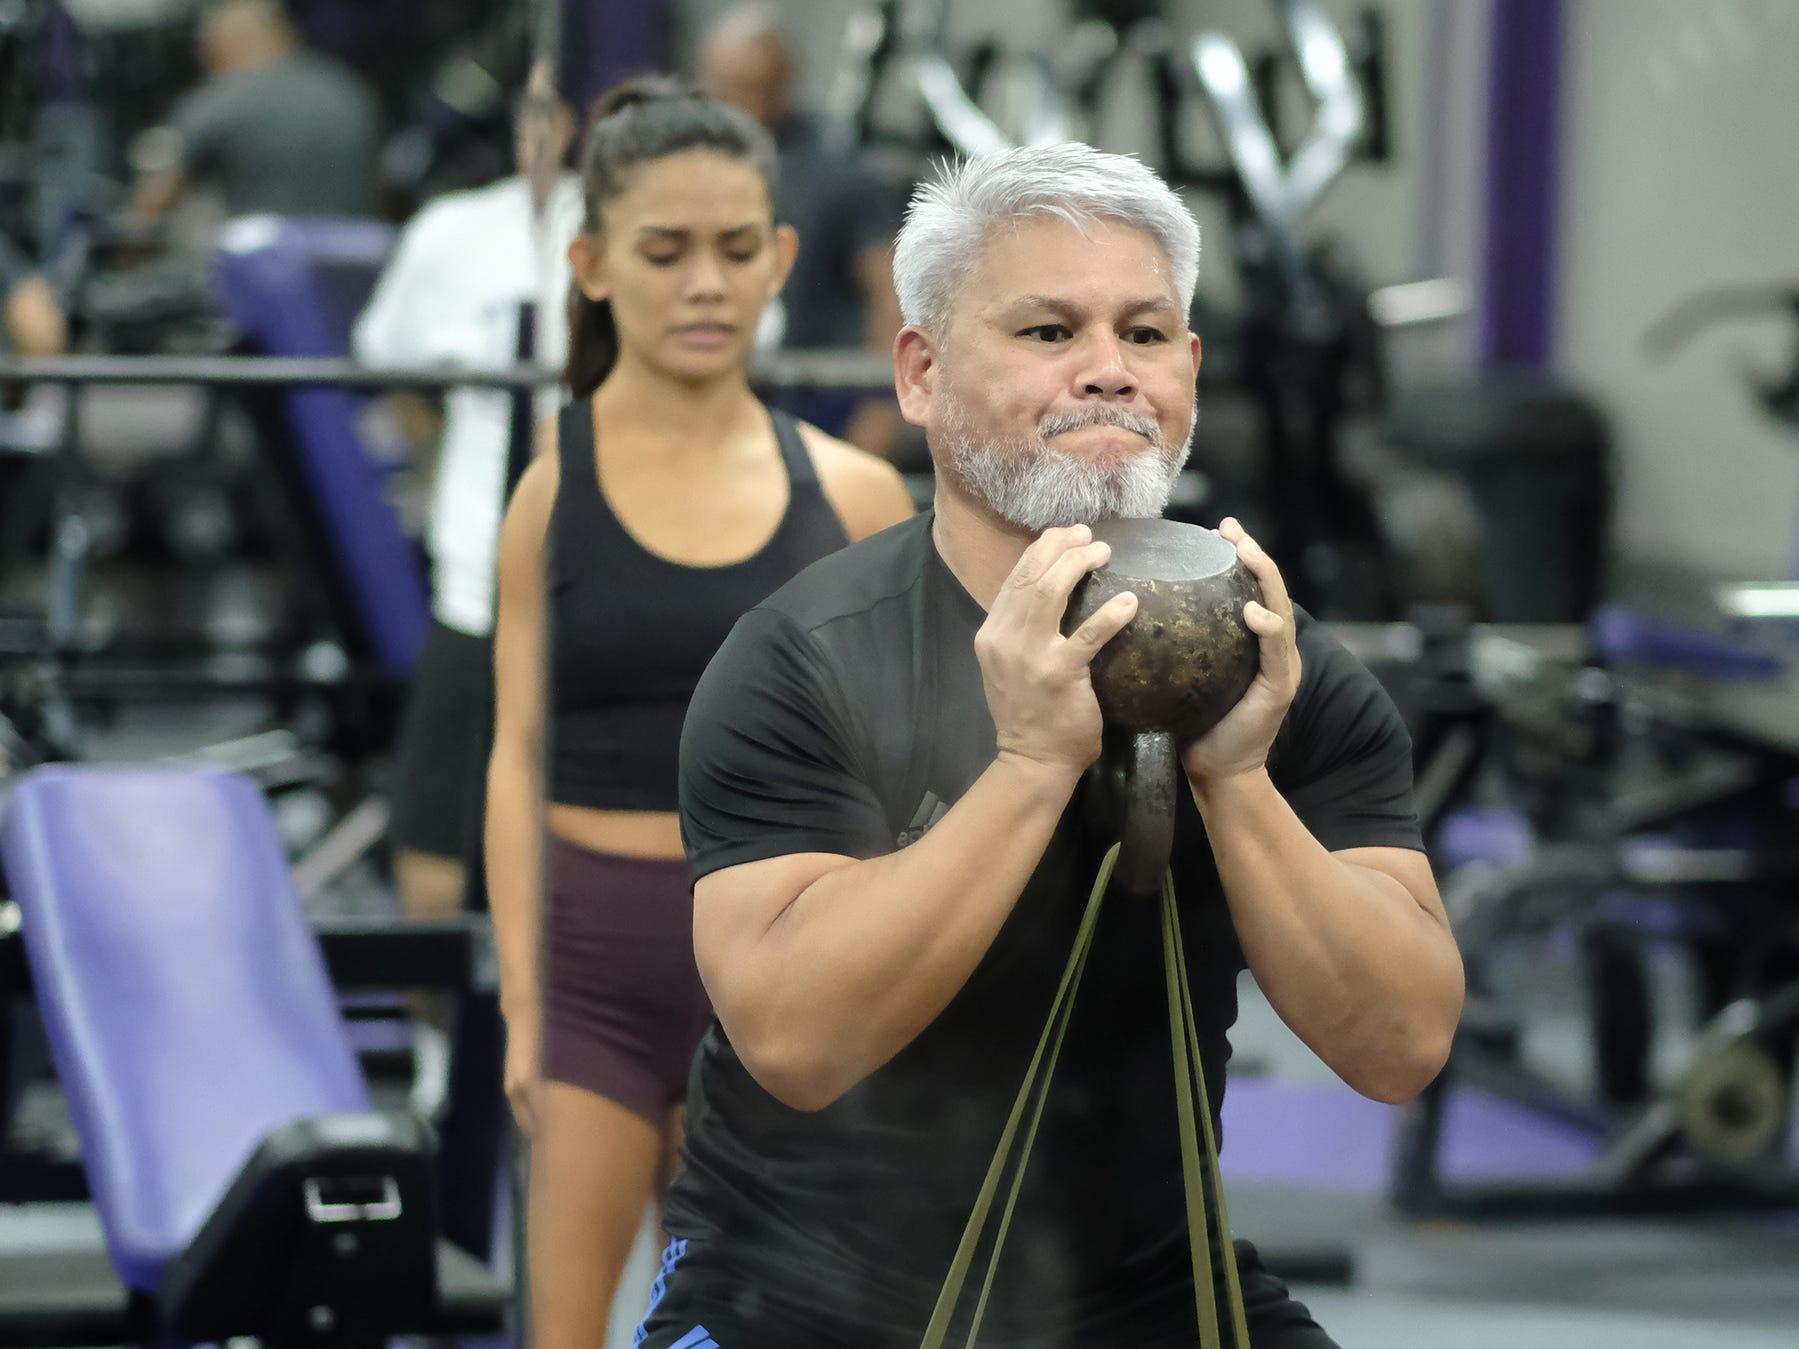 Steve Oshiro at Paradise Fitness in Hagatna November 15, 2018. Oshiro has trained many physique and bodybuilding contest winners.